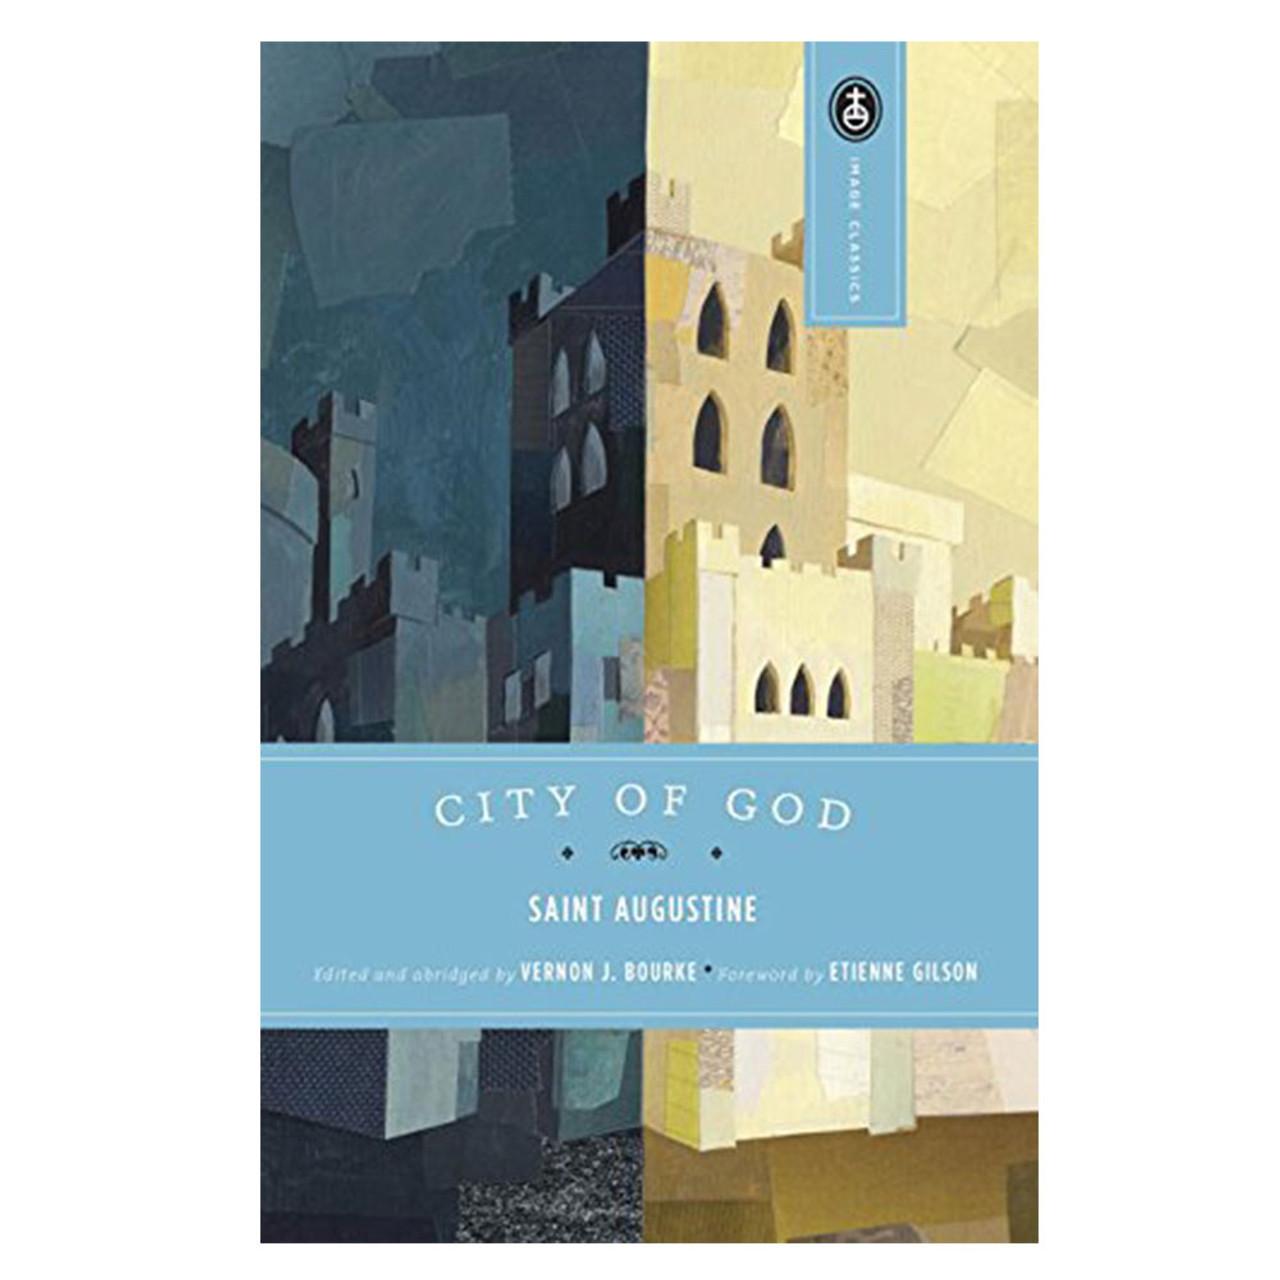 City of God St. Augustine